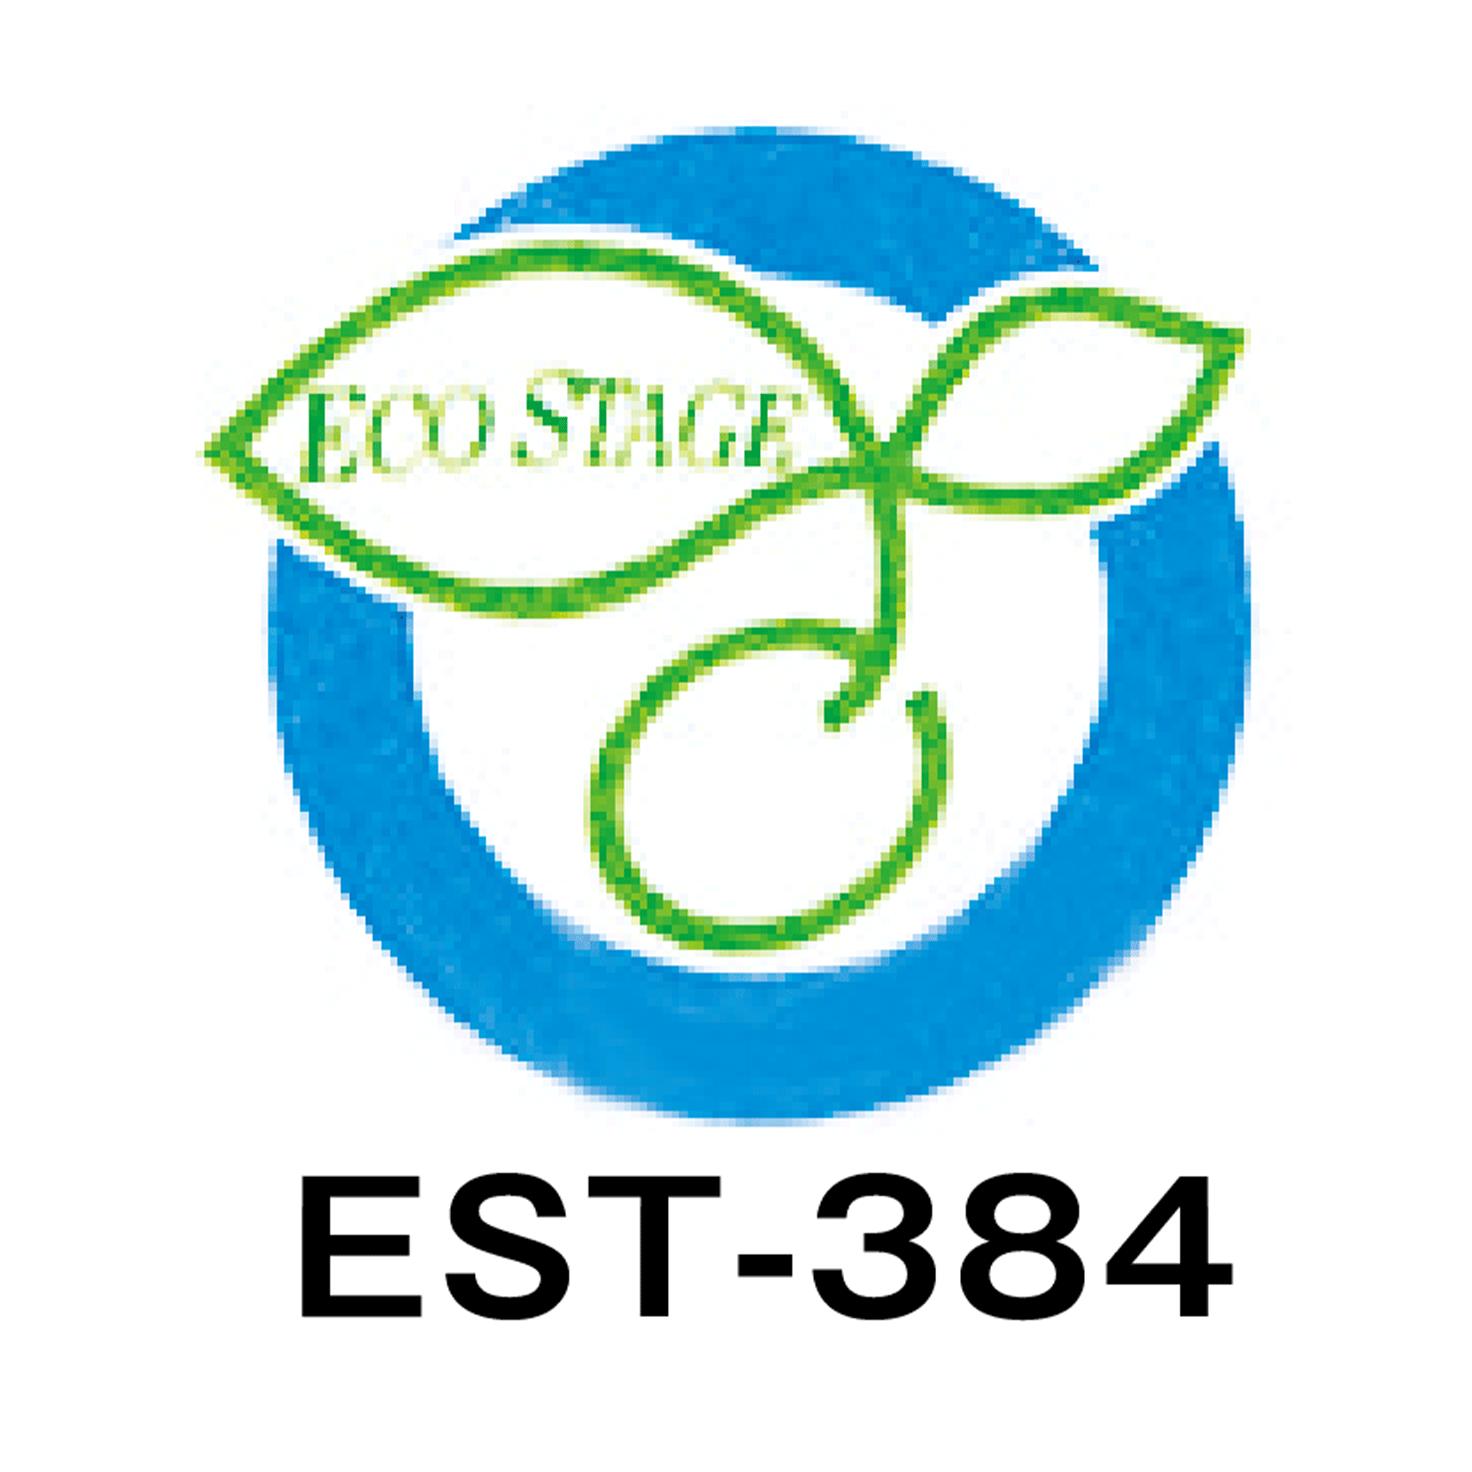 EST-384